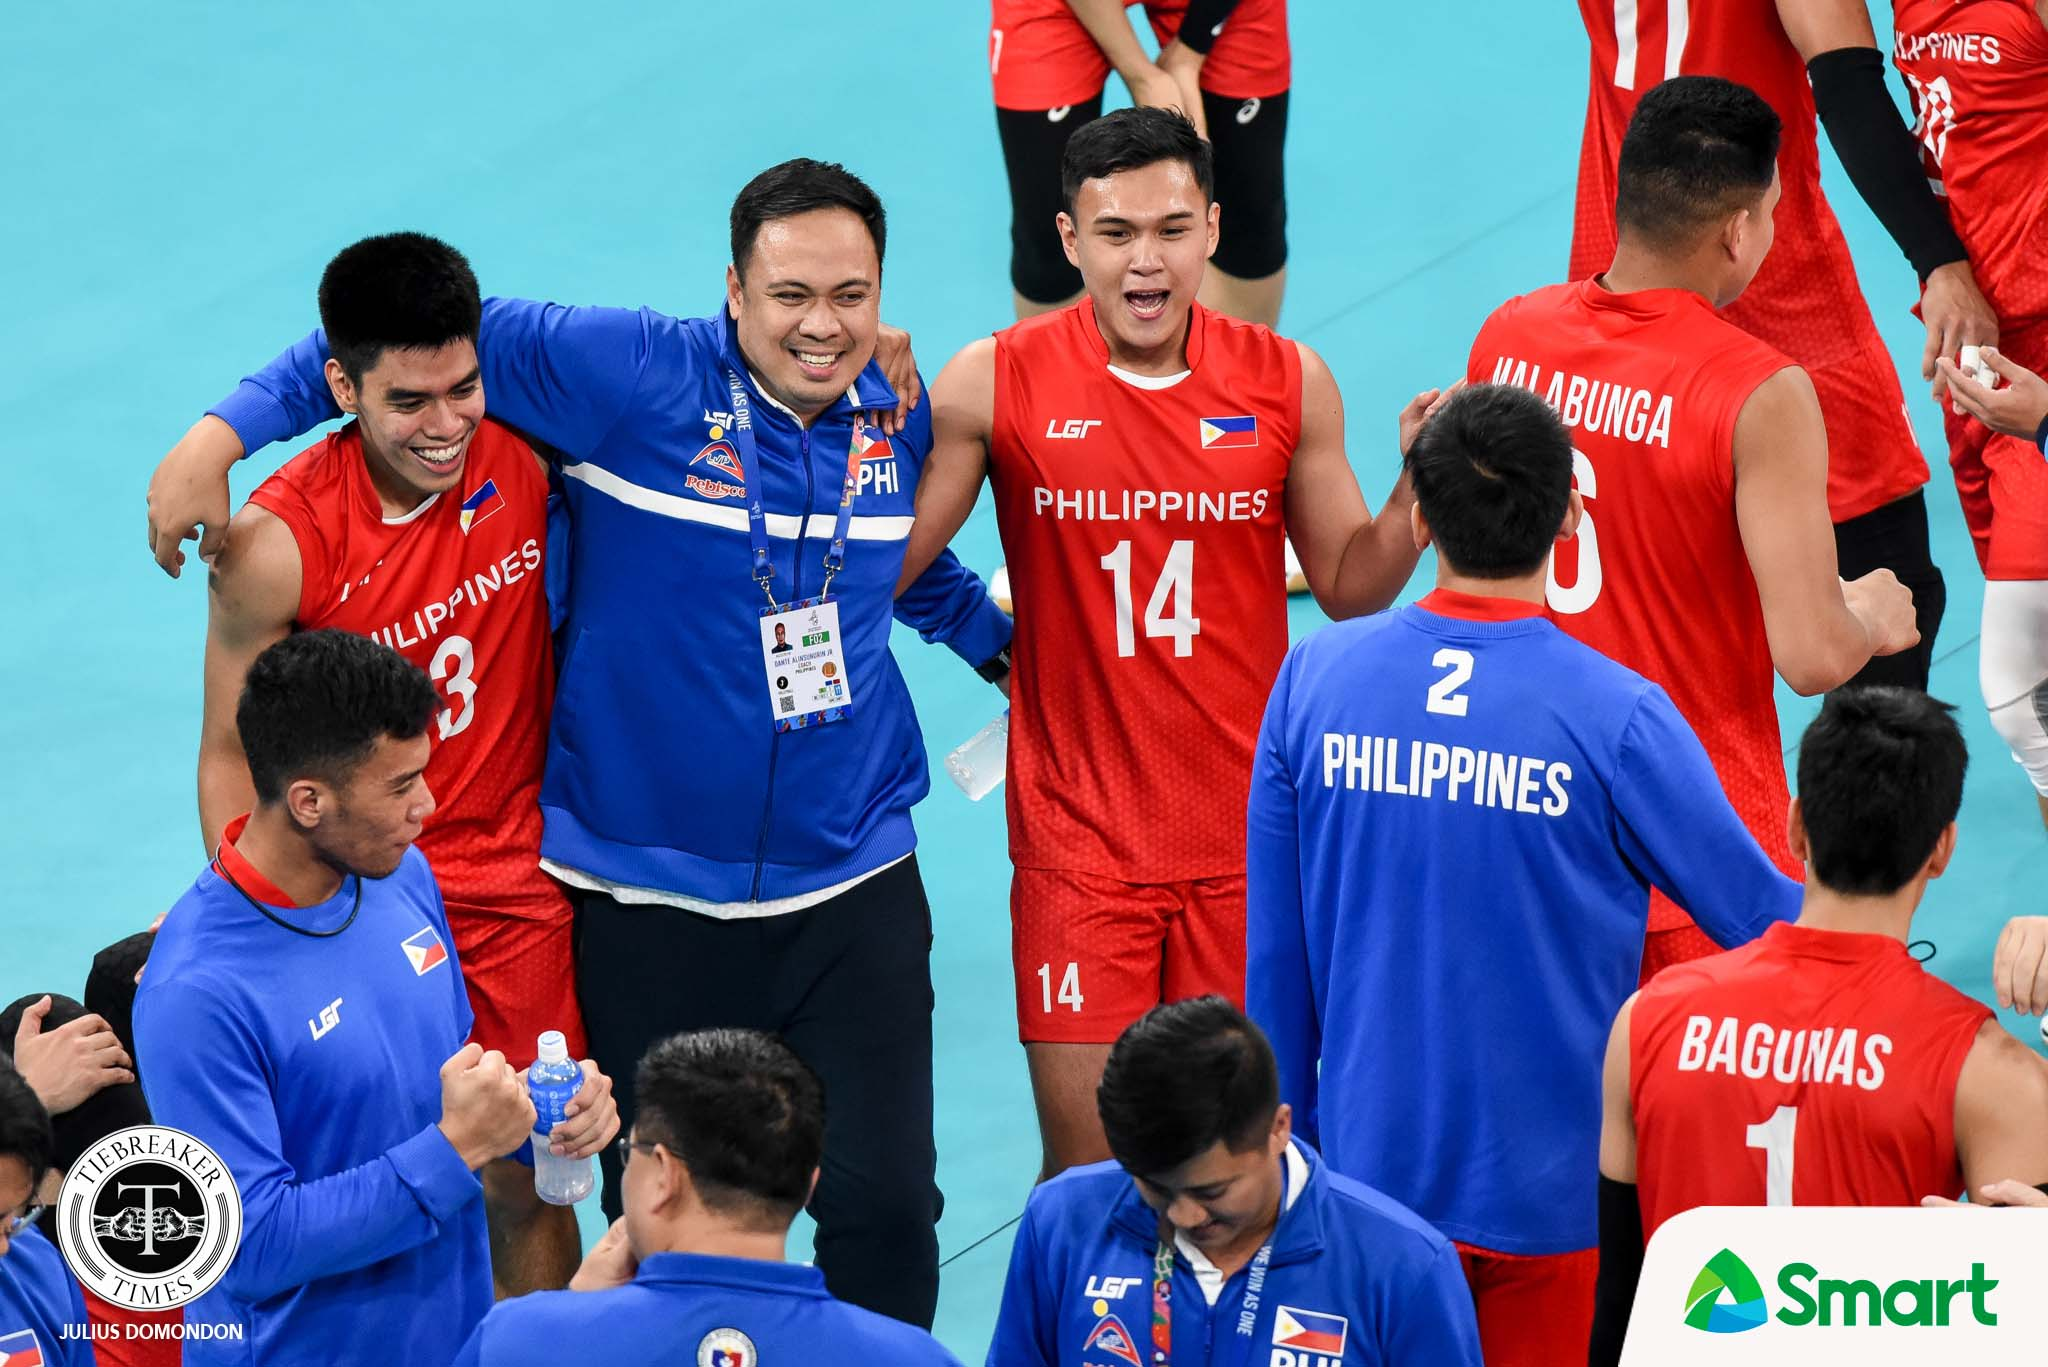 2019-SEA-Games-Philippines-vs-Vietnam-Alinsunurin Alinsunurin expects this trio to fill void left by Espejo, Bagunas News Volleyball  - philippine sports news